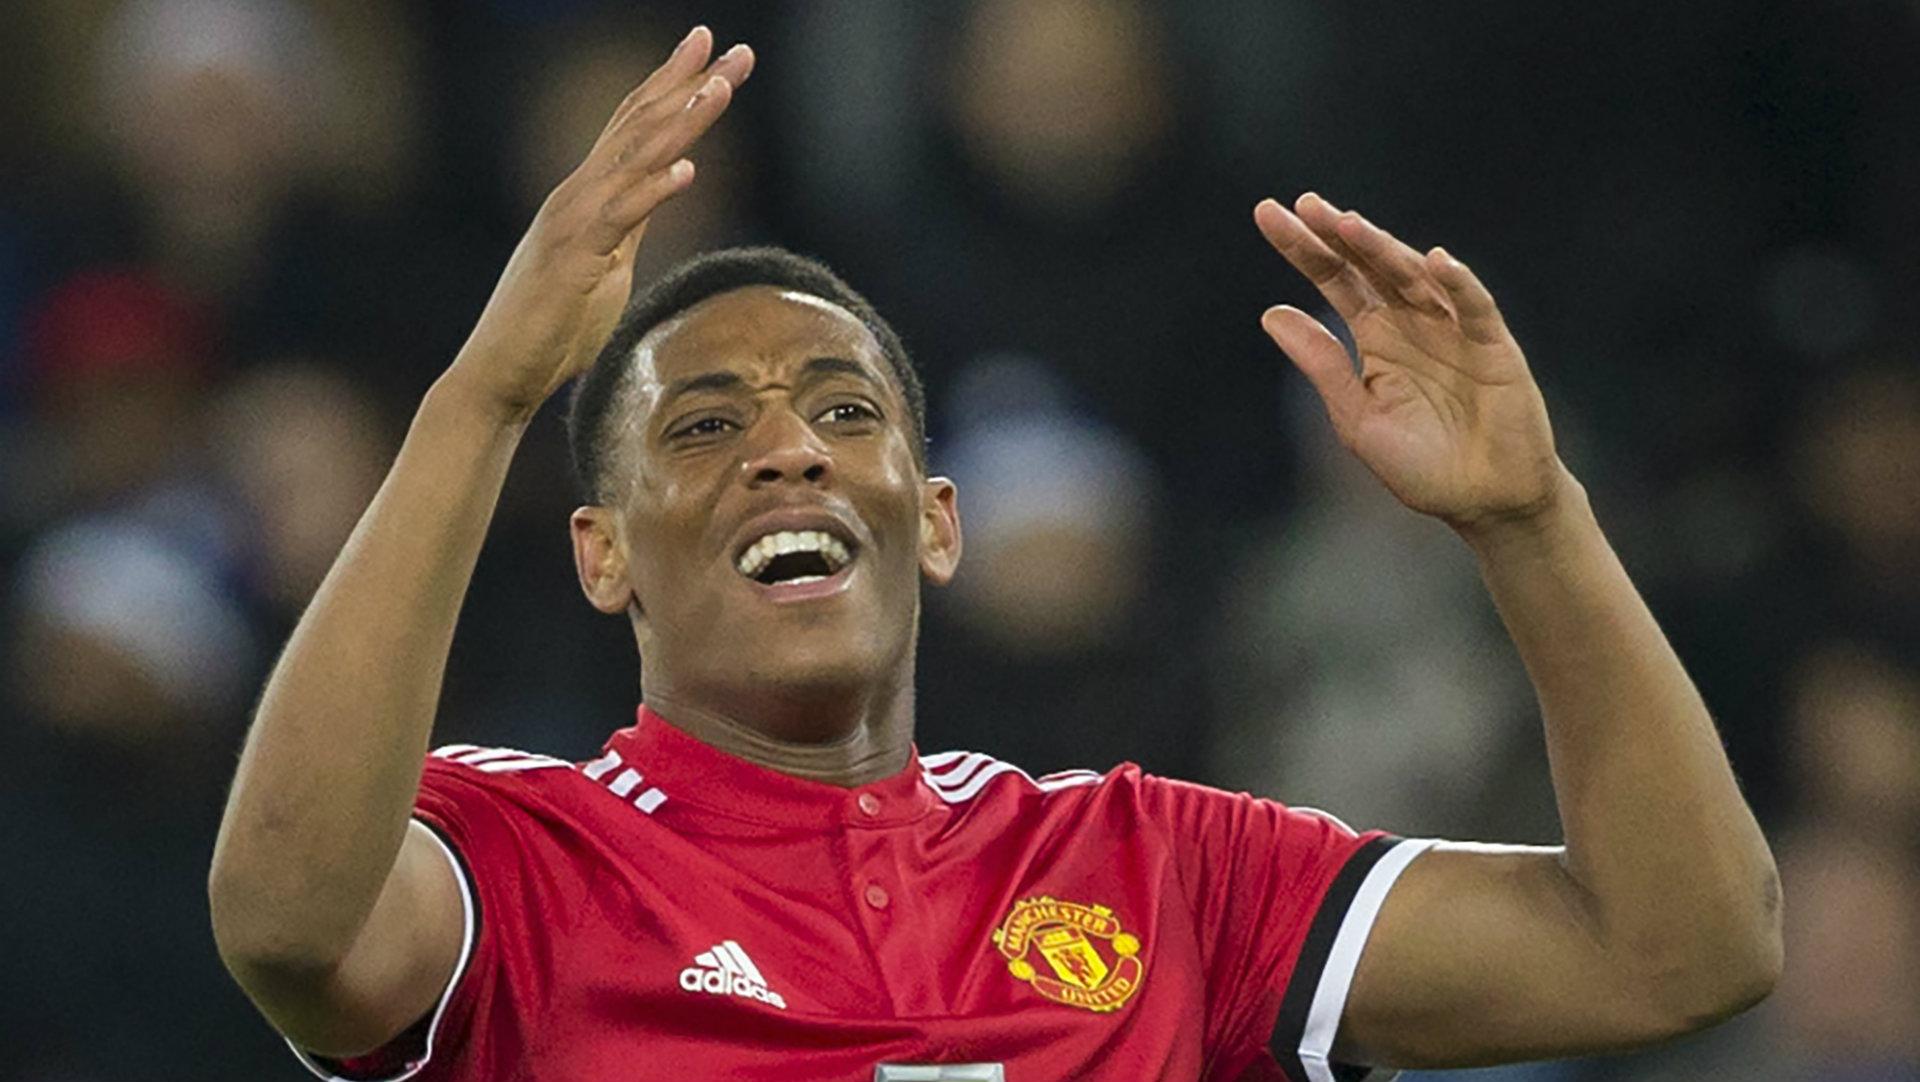 Anthony Martial, Leicester vs Man Utd, 17/18